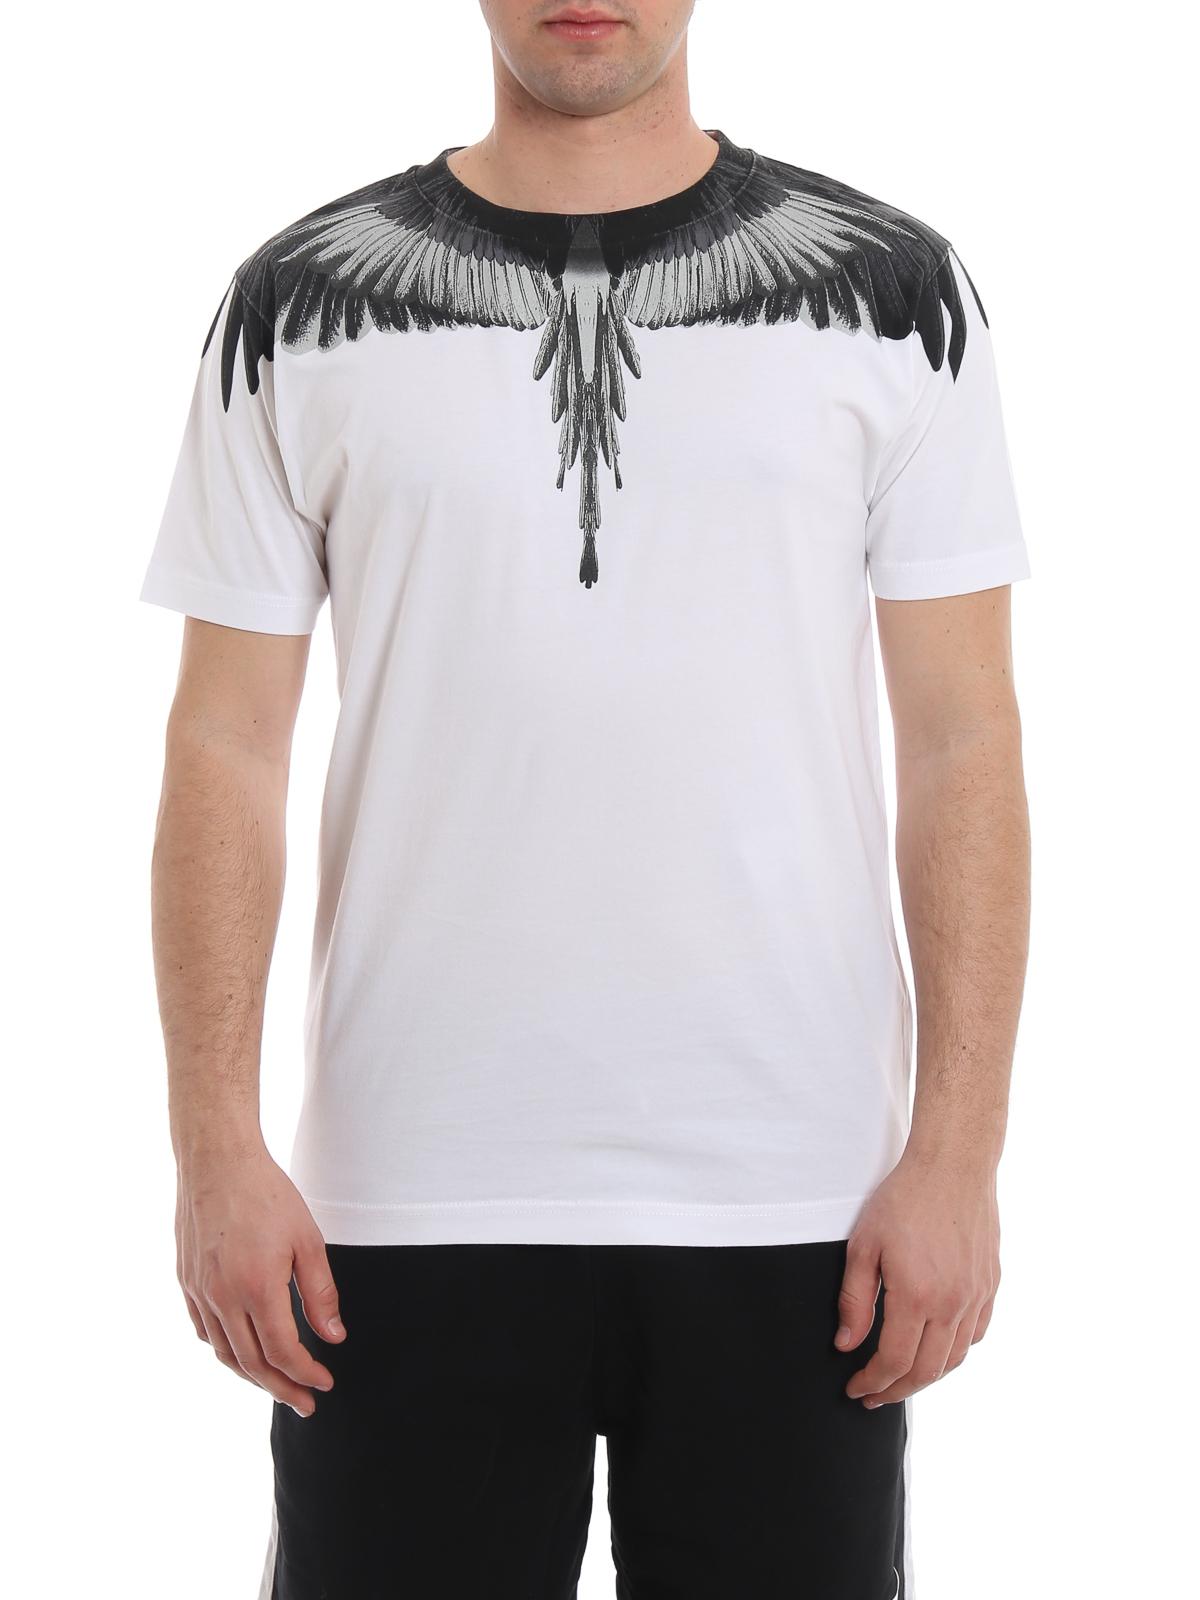 Burlon shirt T Bianca Wings Ikrix Marcelo Cotone bg6fy7